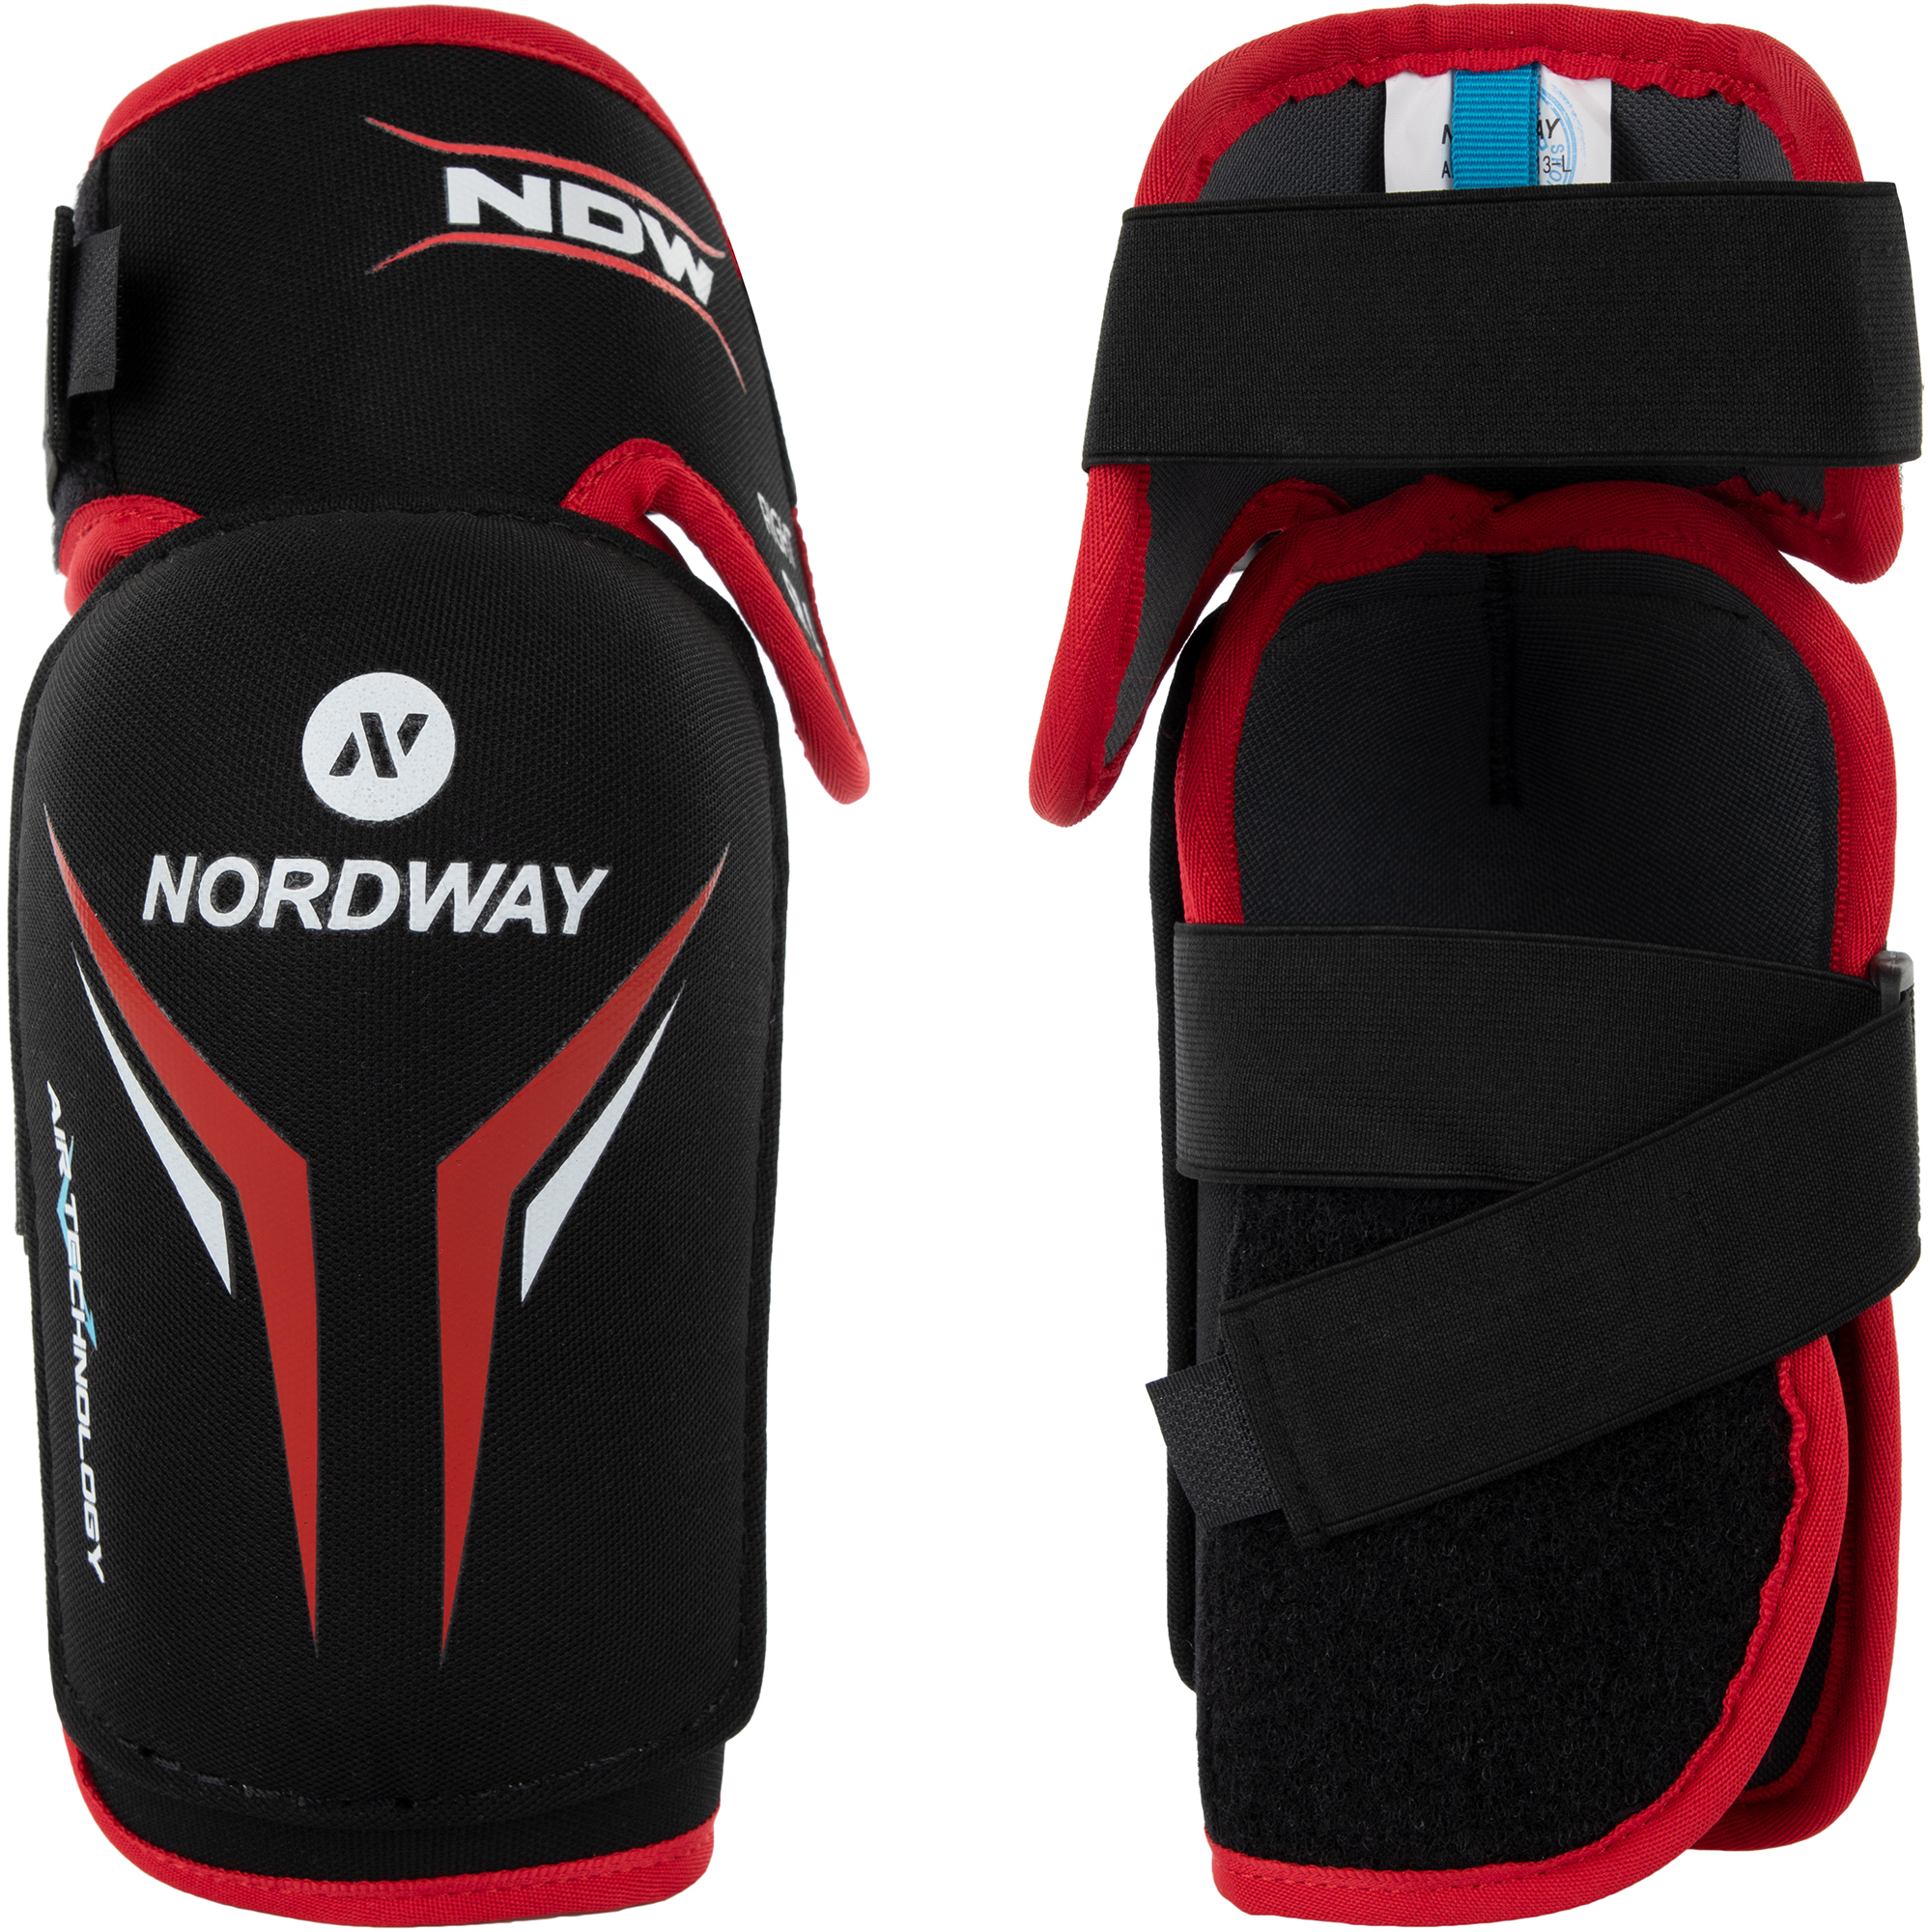 Nordway Налокотники хоккейные Nordway 3.0 SR nordway щитки хоккейные детские nordway